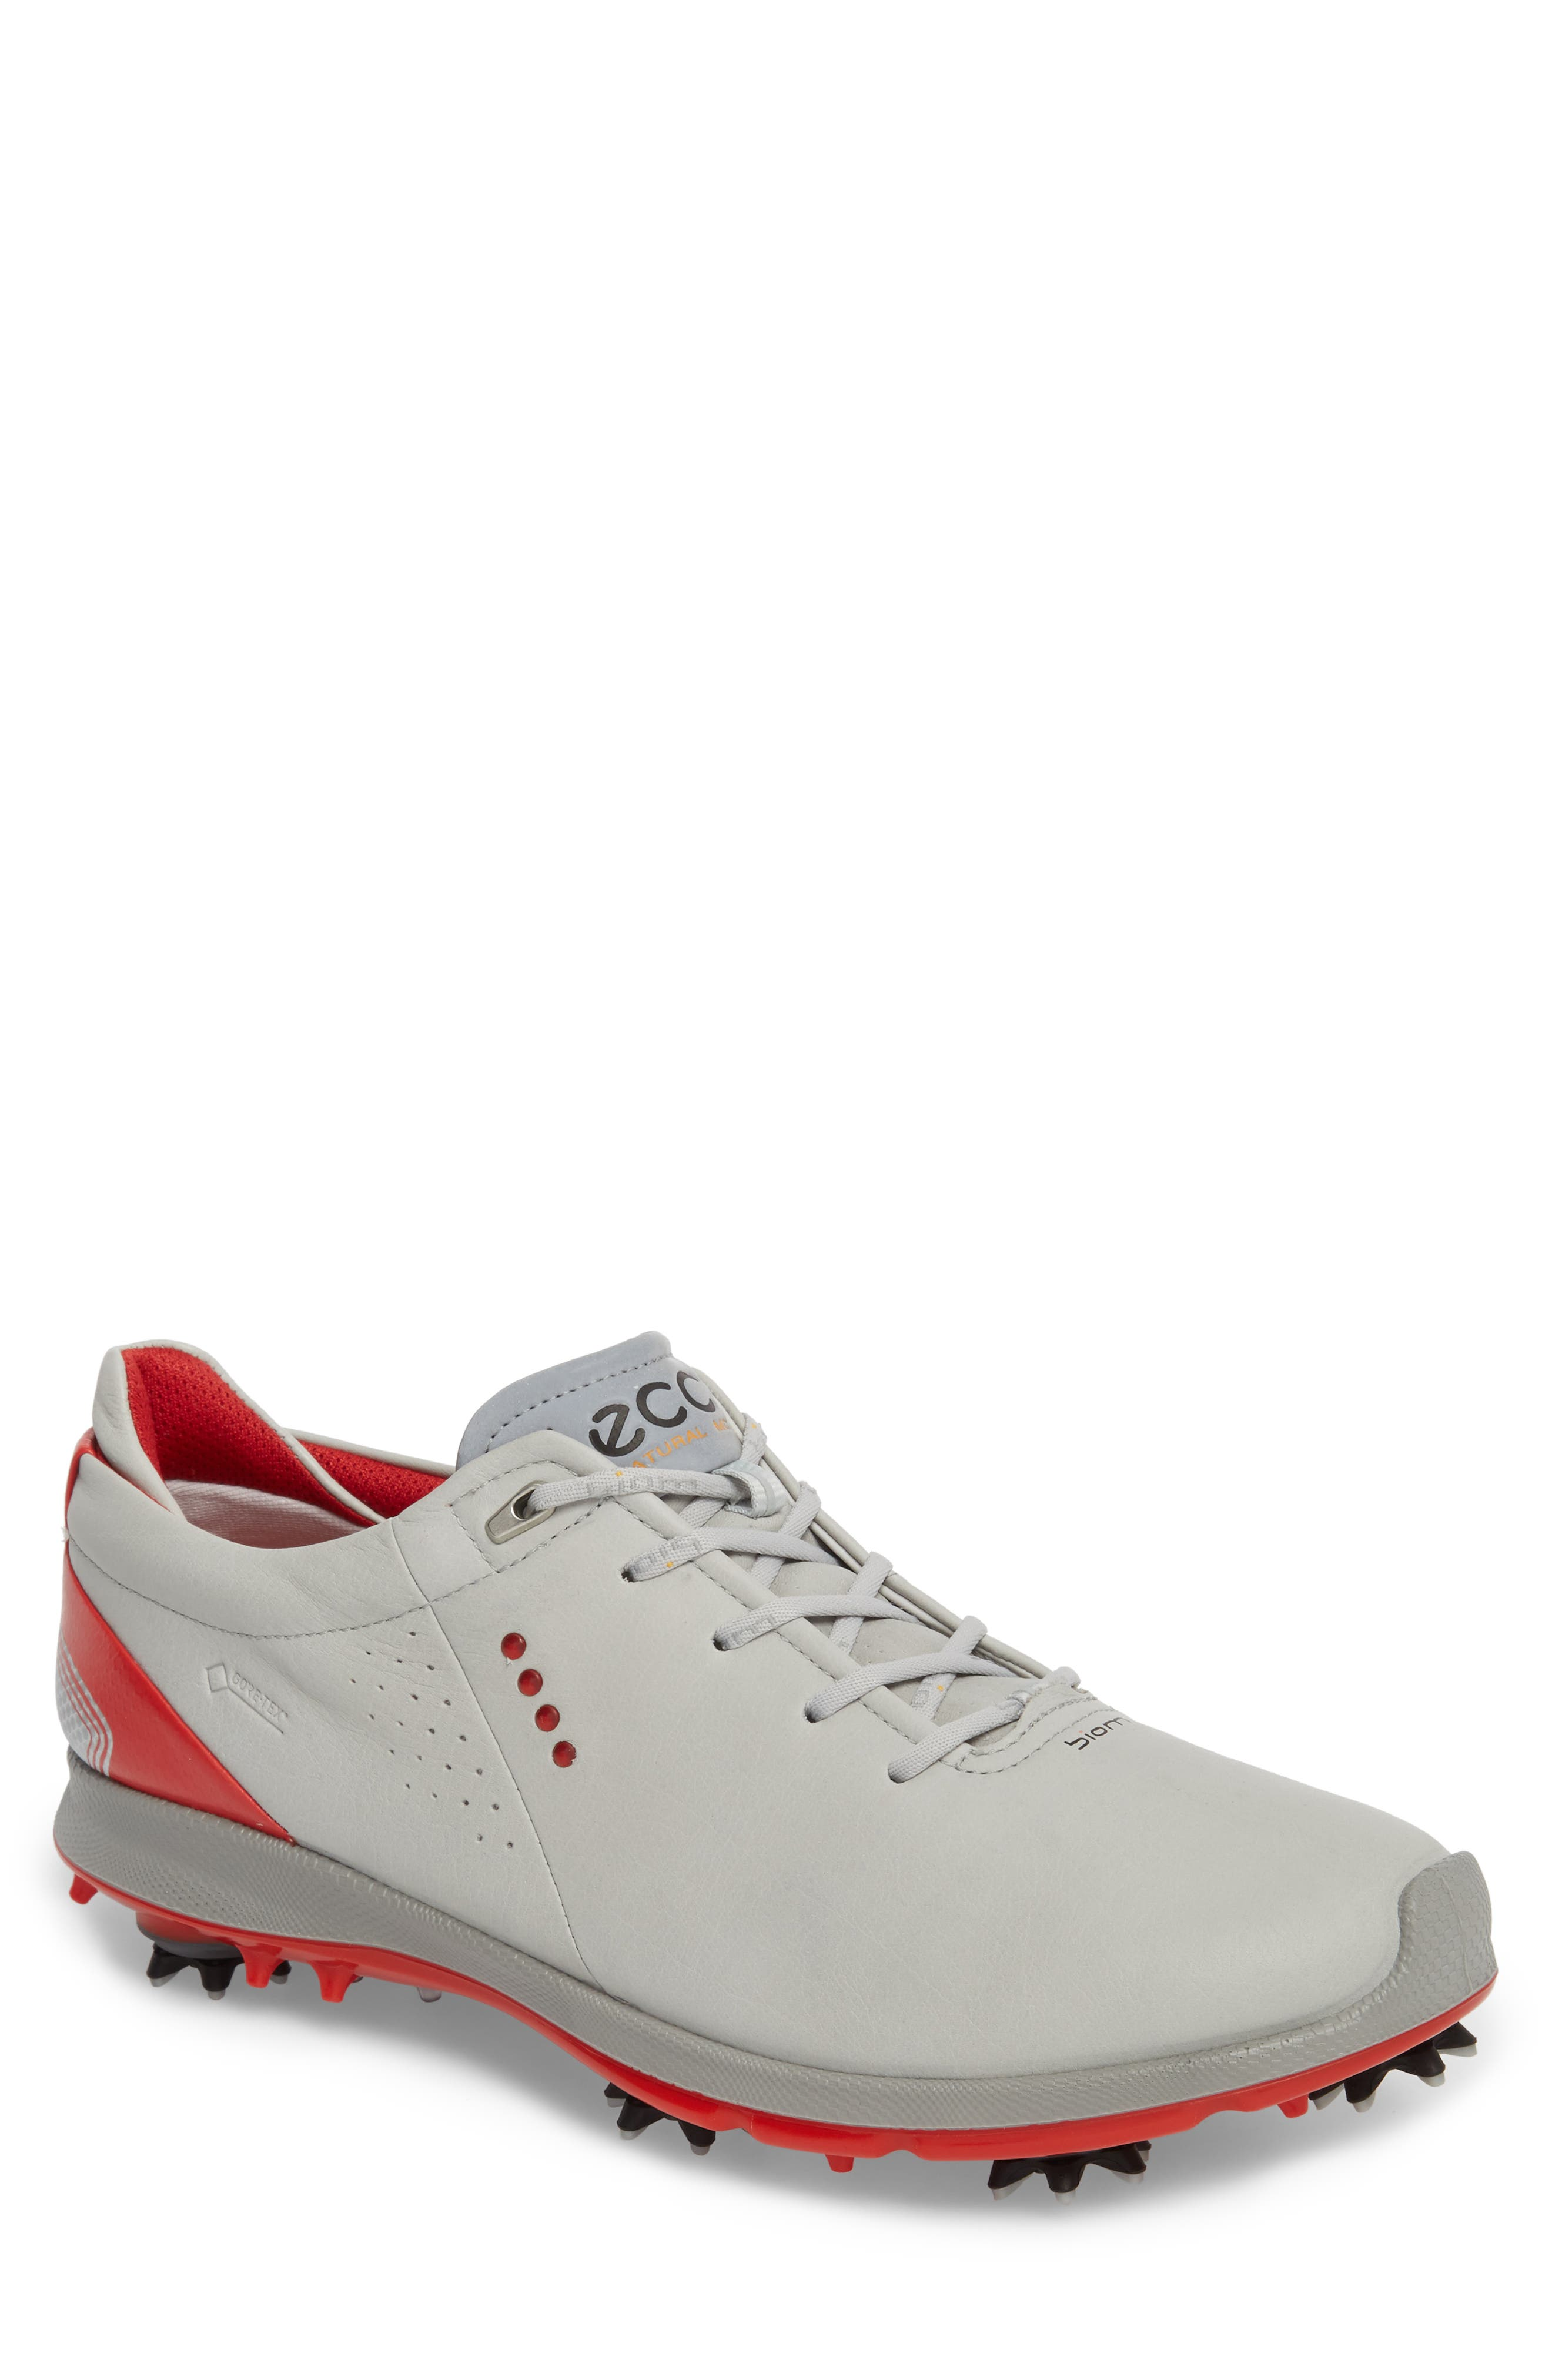 BIOM G 2 Free Gore-Tex<sup>®</sup> Golf Shoe,                             Main thumbnail 1, color,                             Concrete/ Scarlet Leather